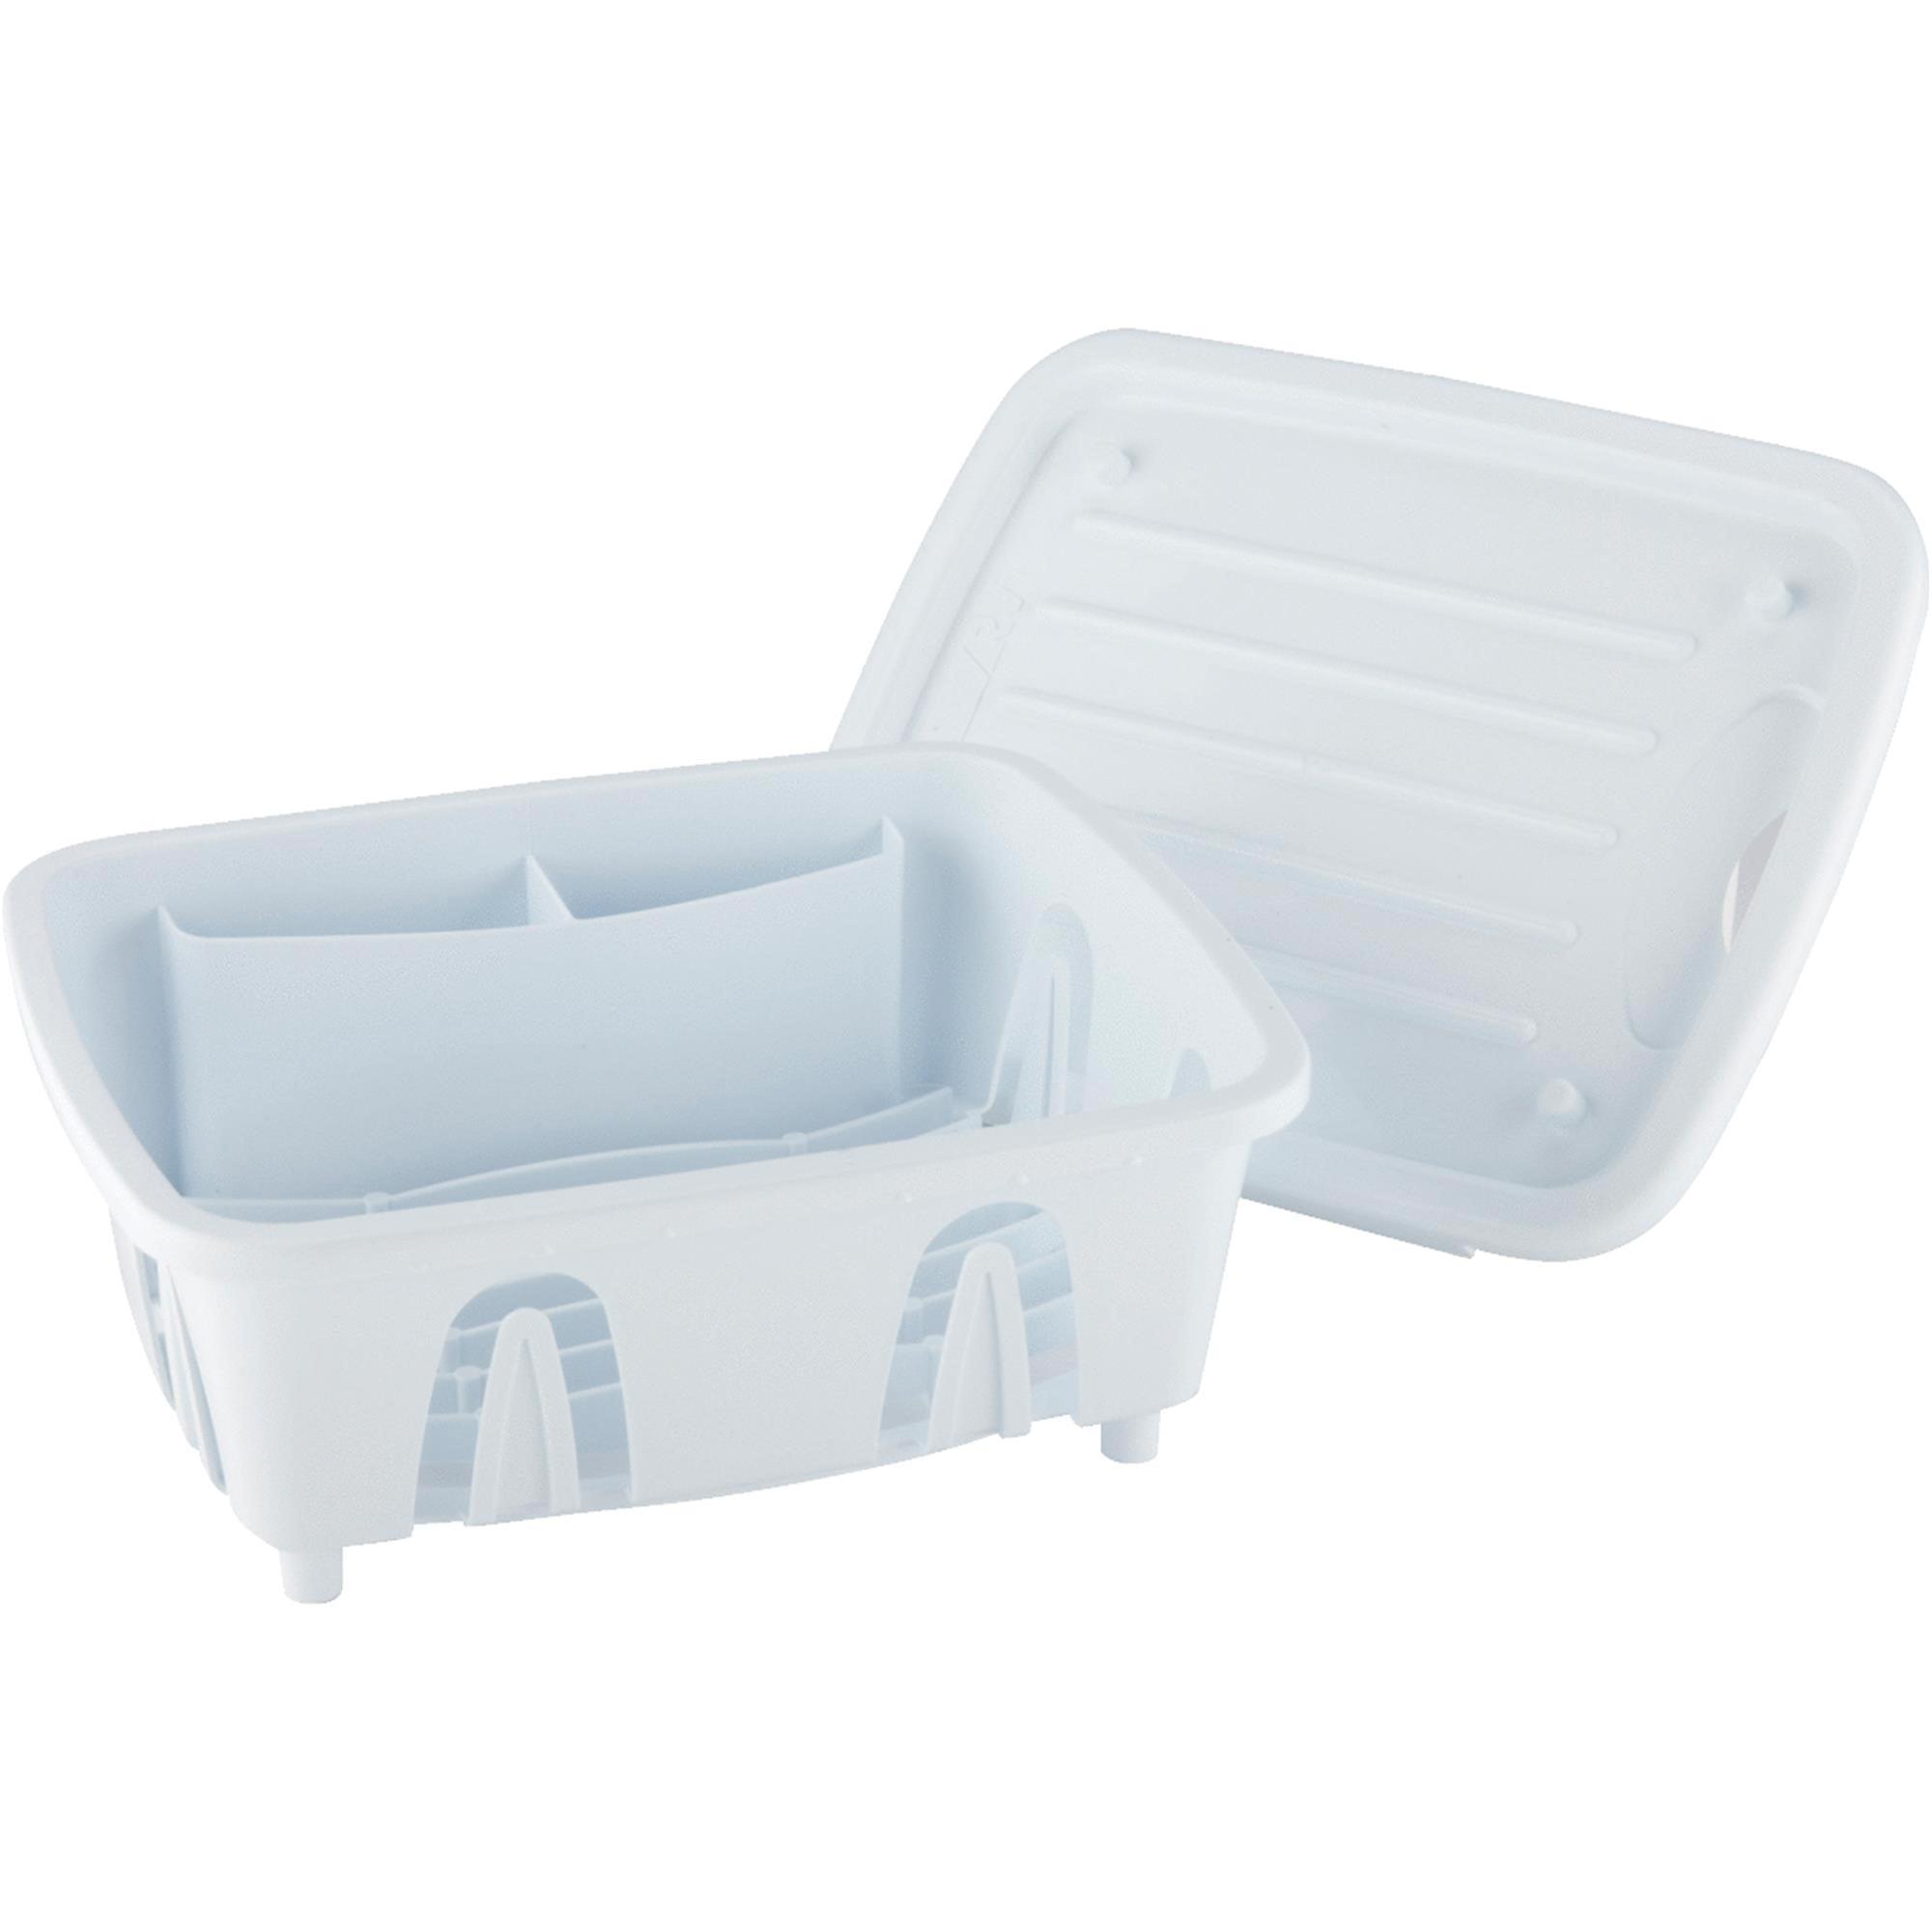 Camco Mini Dish Drainer & Tray 43511